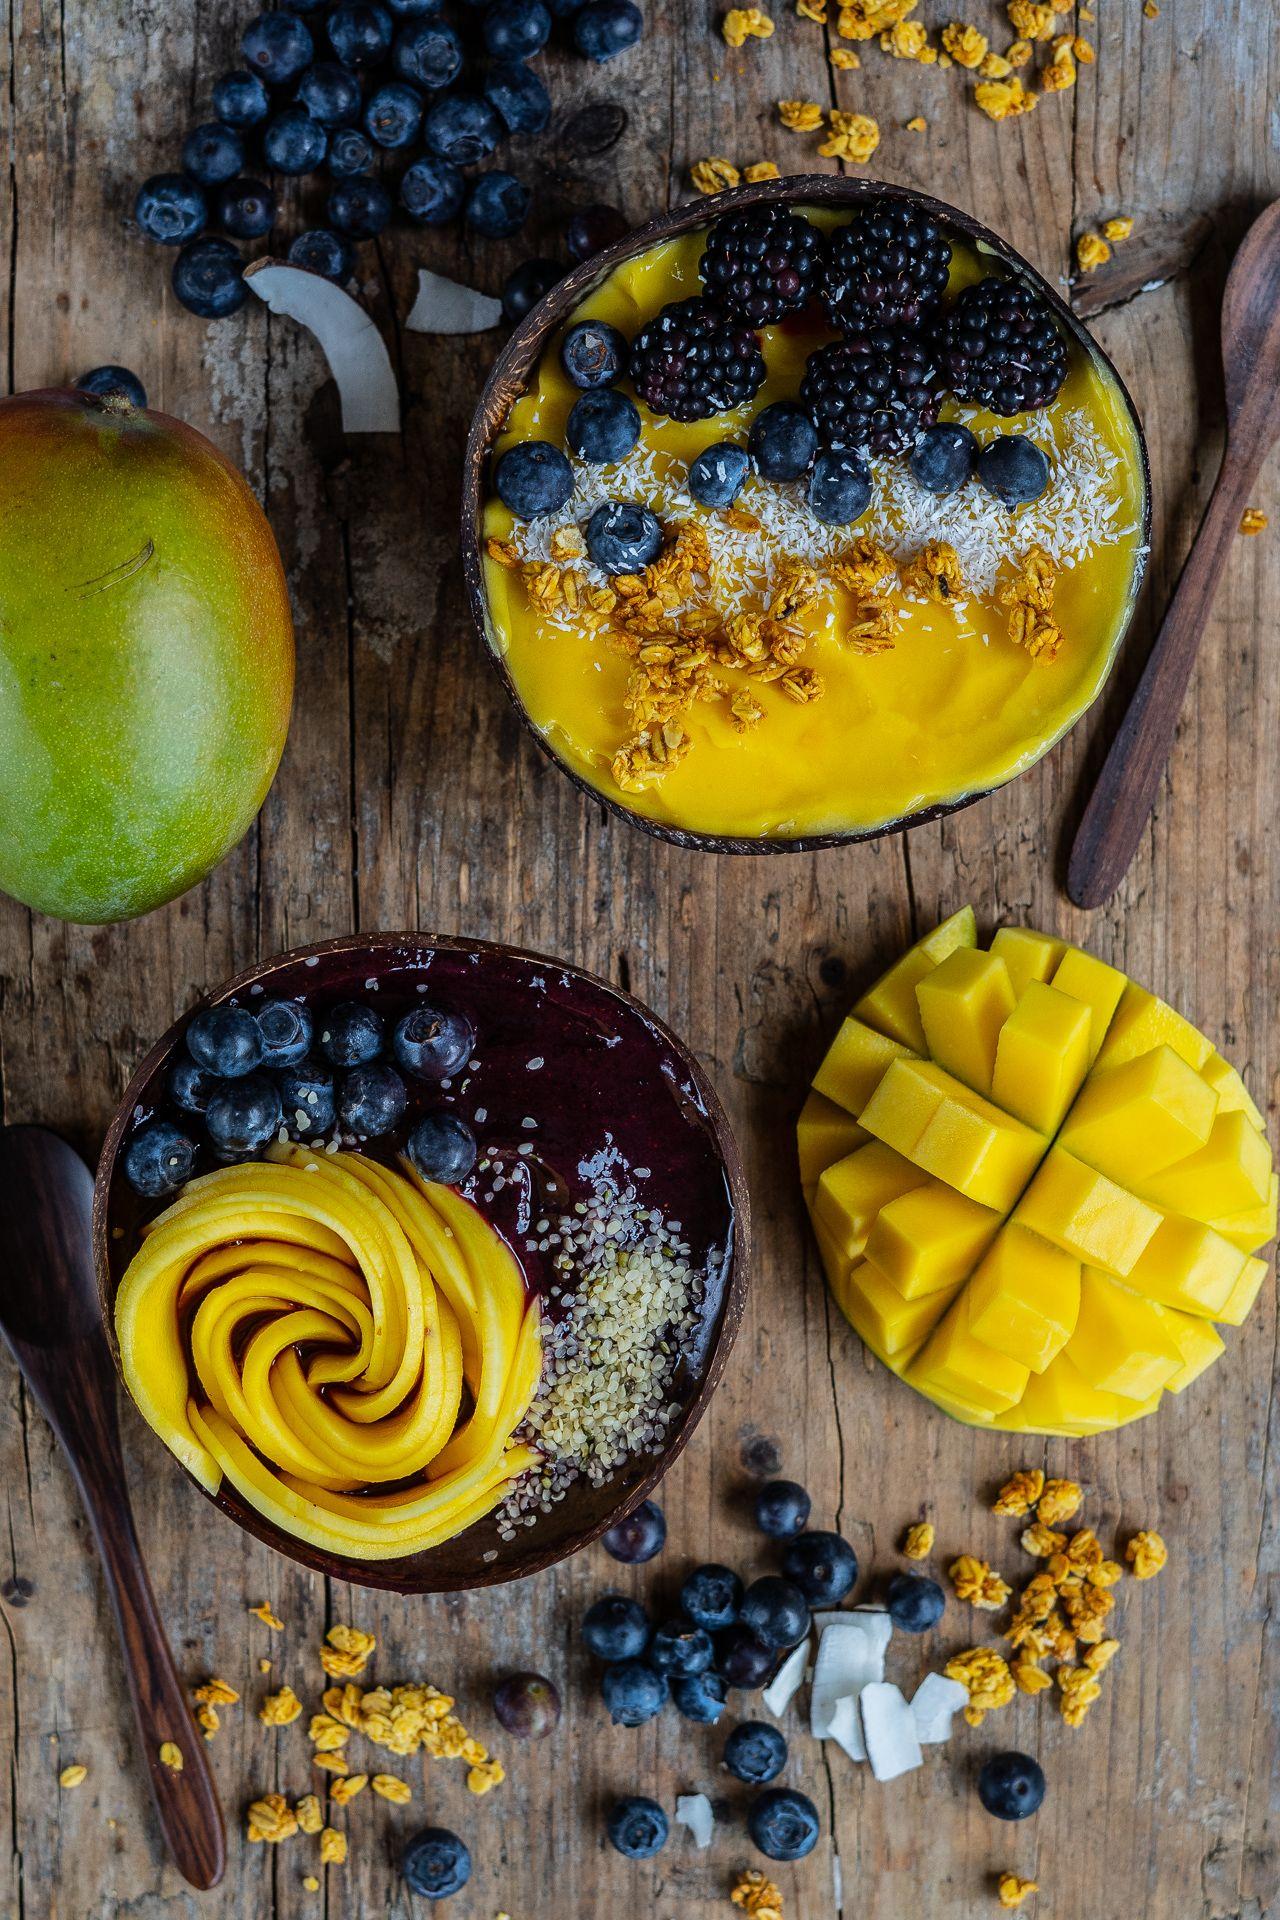 Gesunde 2 Zutaten Nicecream - ohne Banane, vegan - Mrs Flury